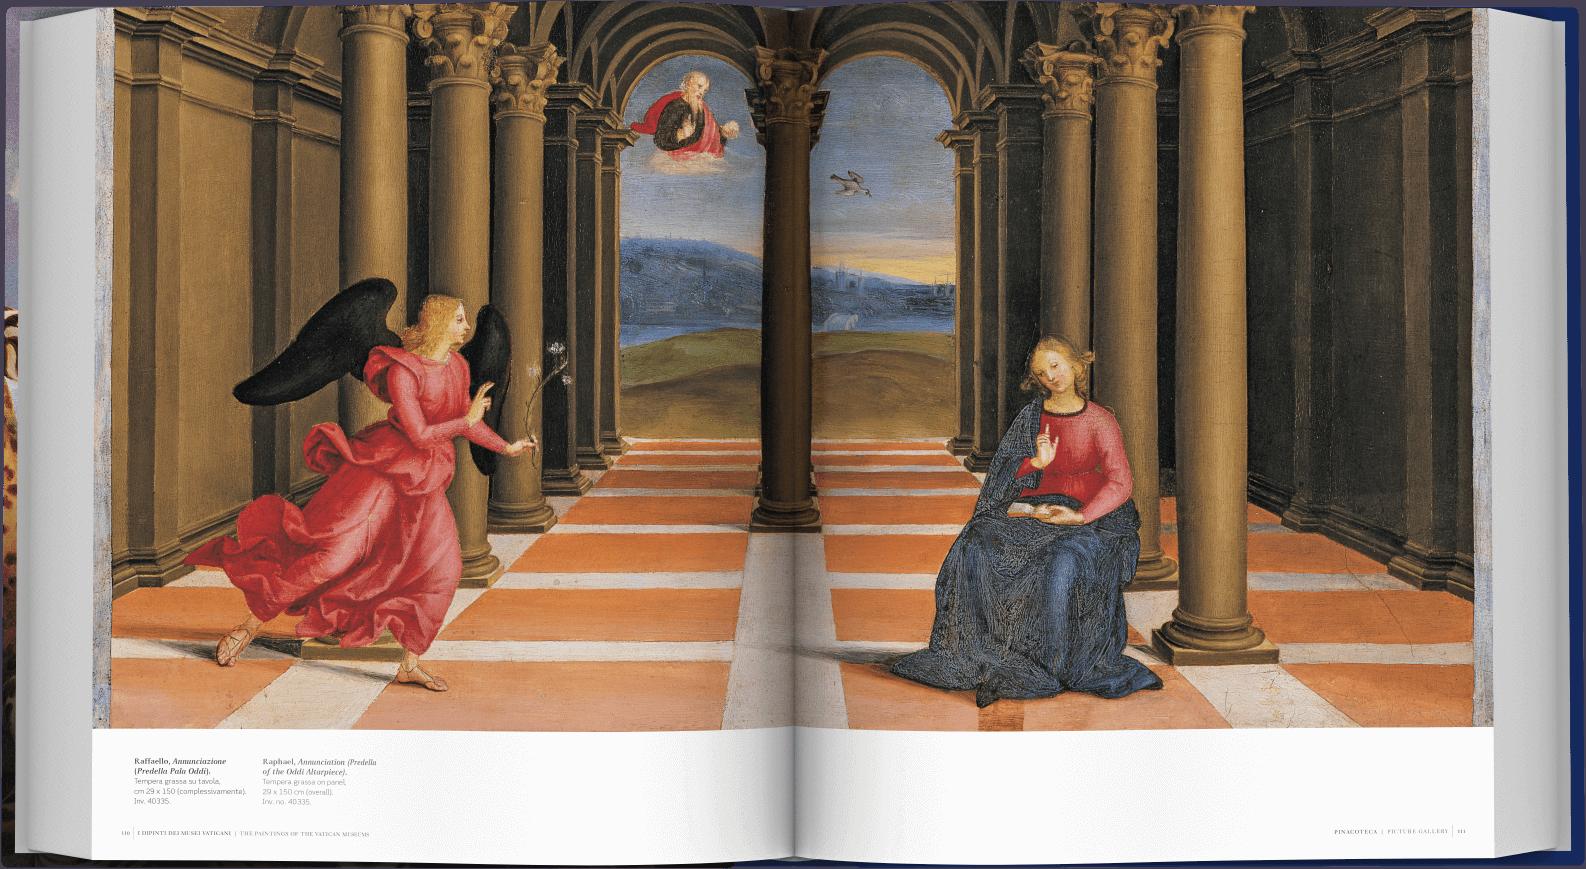 dipinti-musei-vaticani-bookshop-7